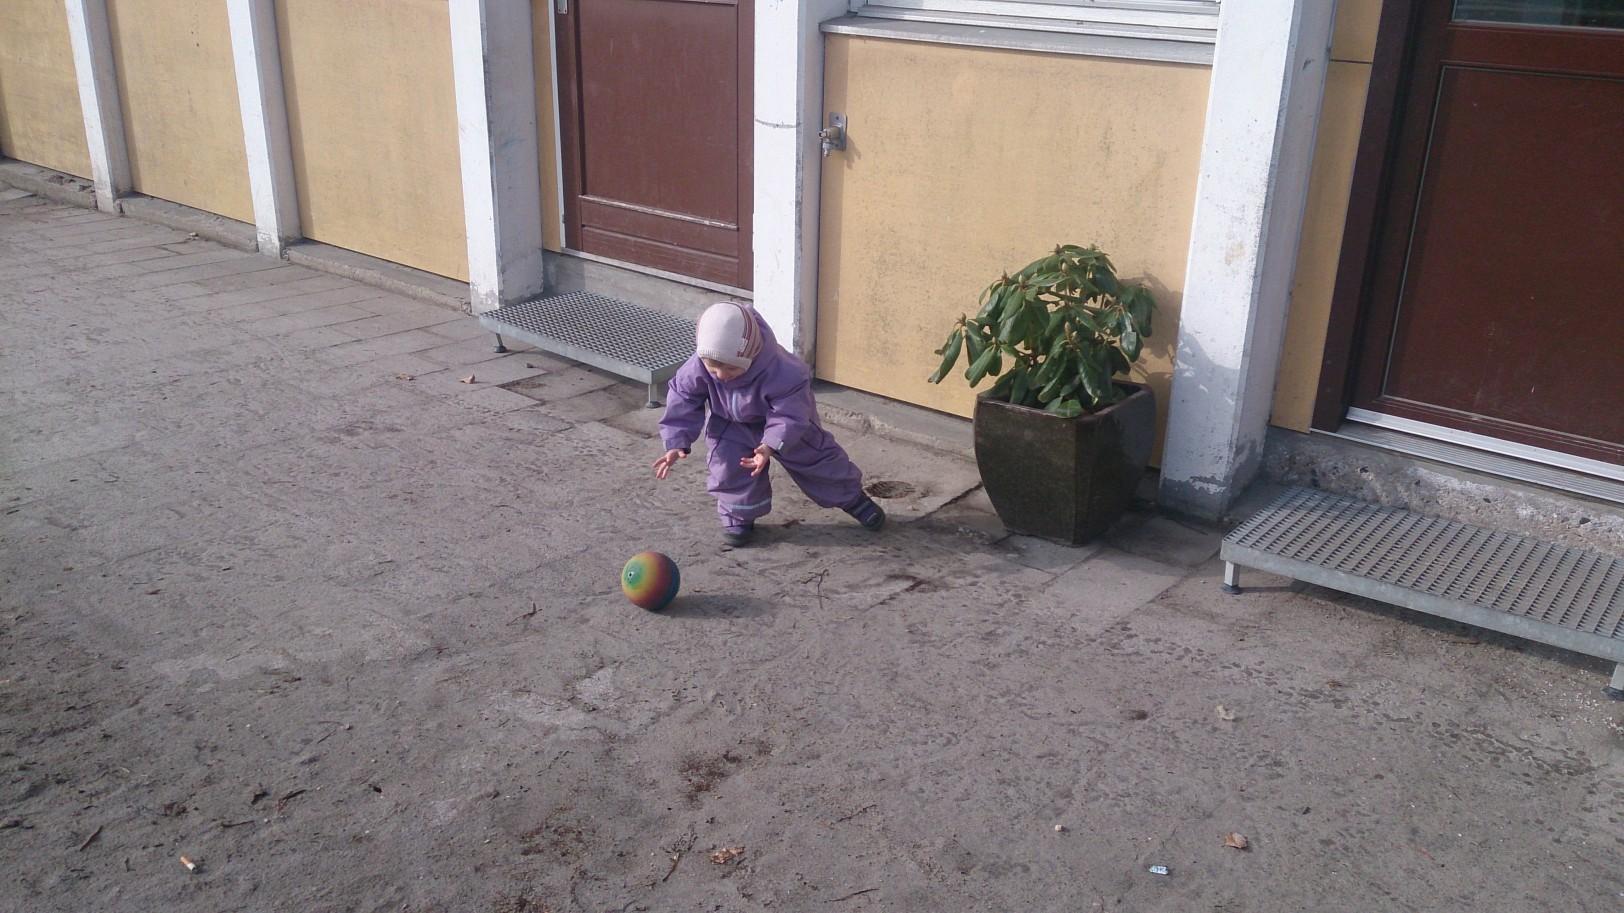 Alva chasing down the ball